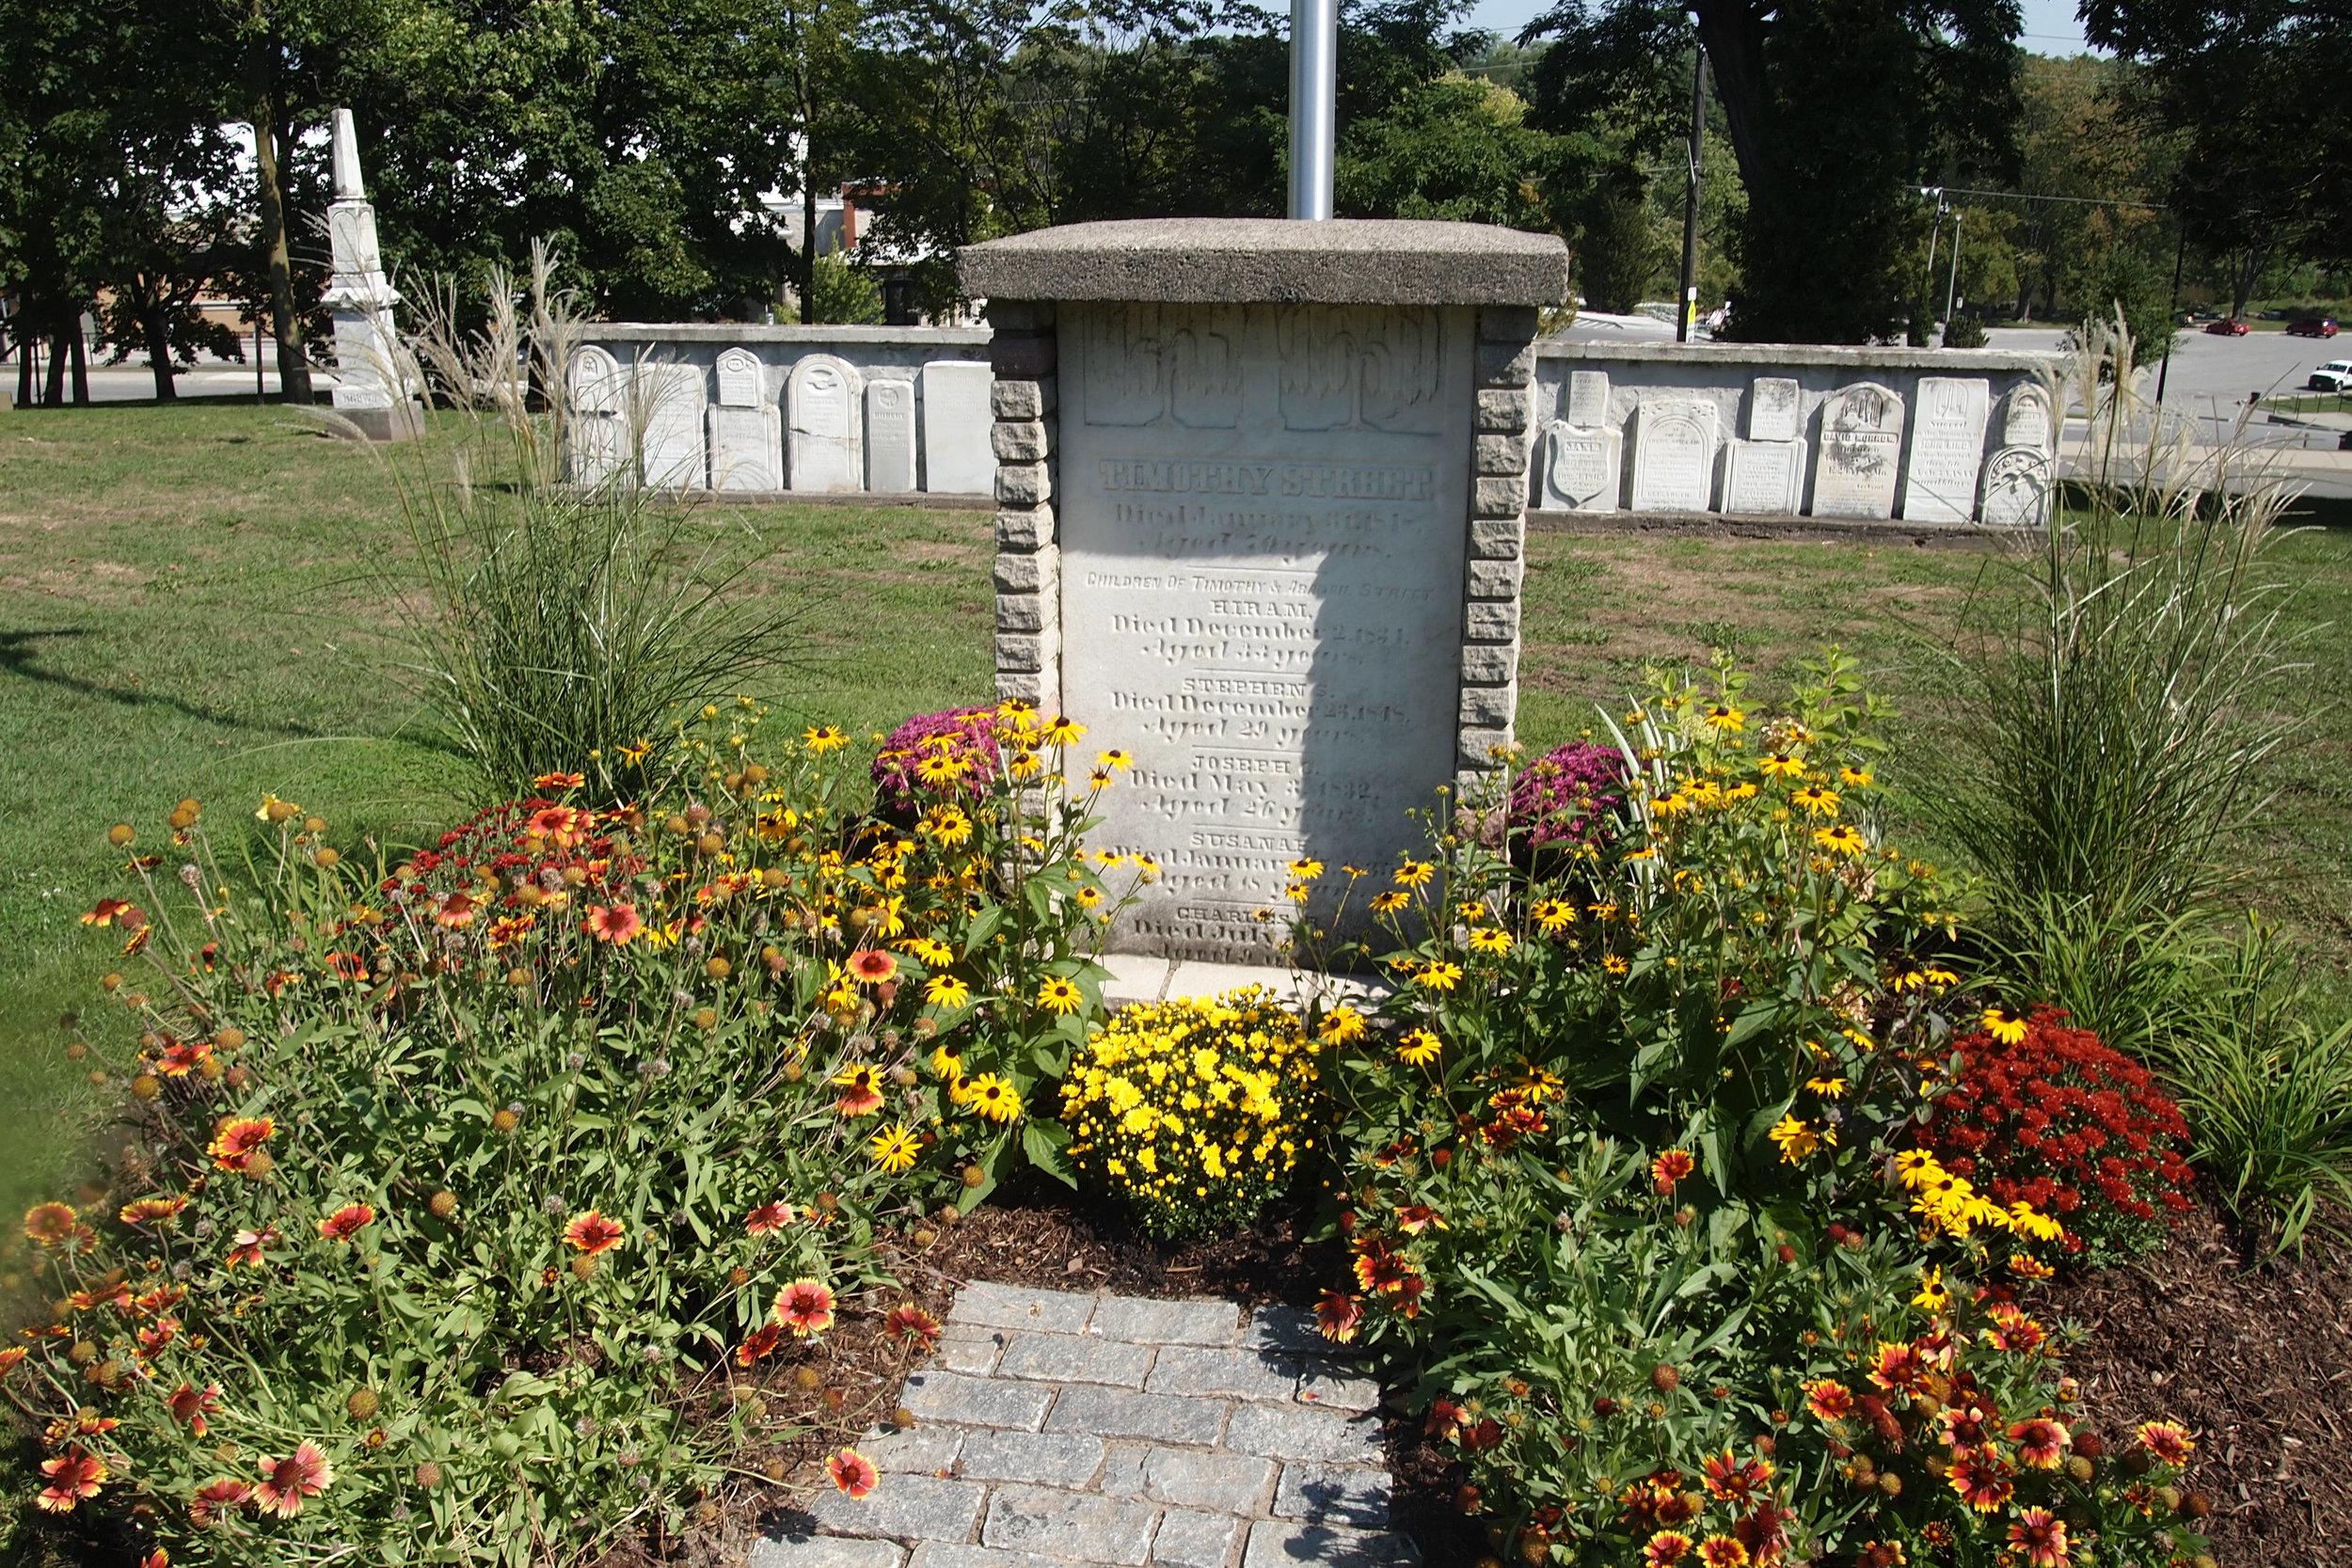 Timothy Street gravesite - Streetsville Memorial Cemetery.